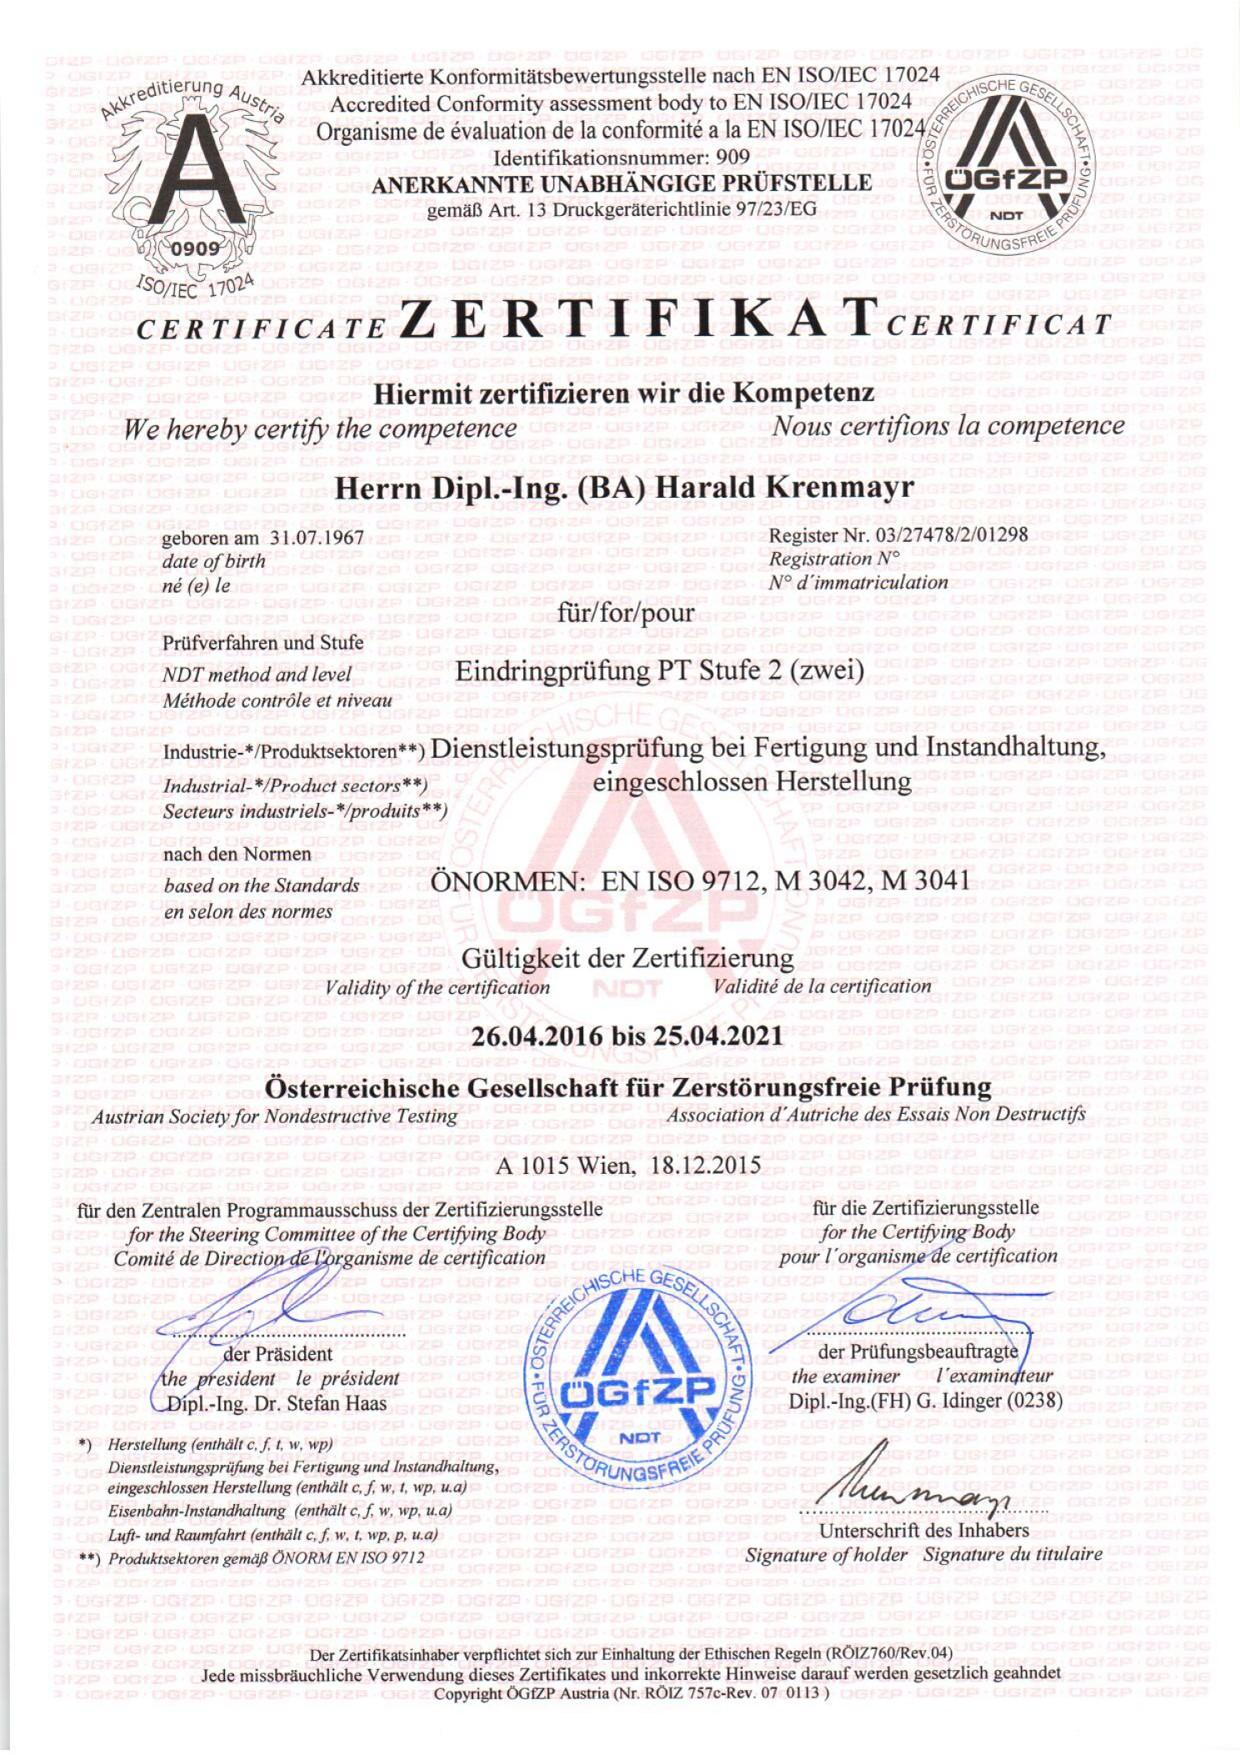 Zertifikat Farbeindringprüfung